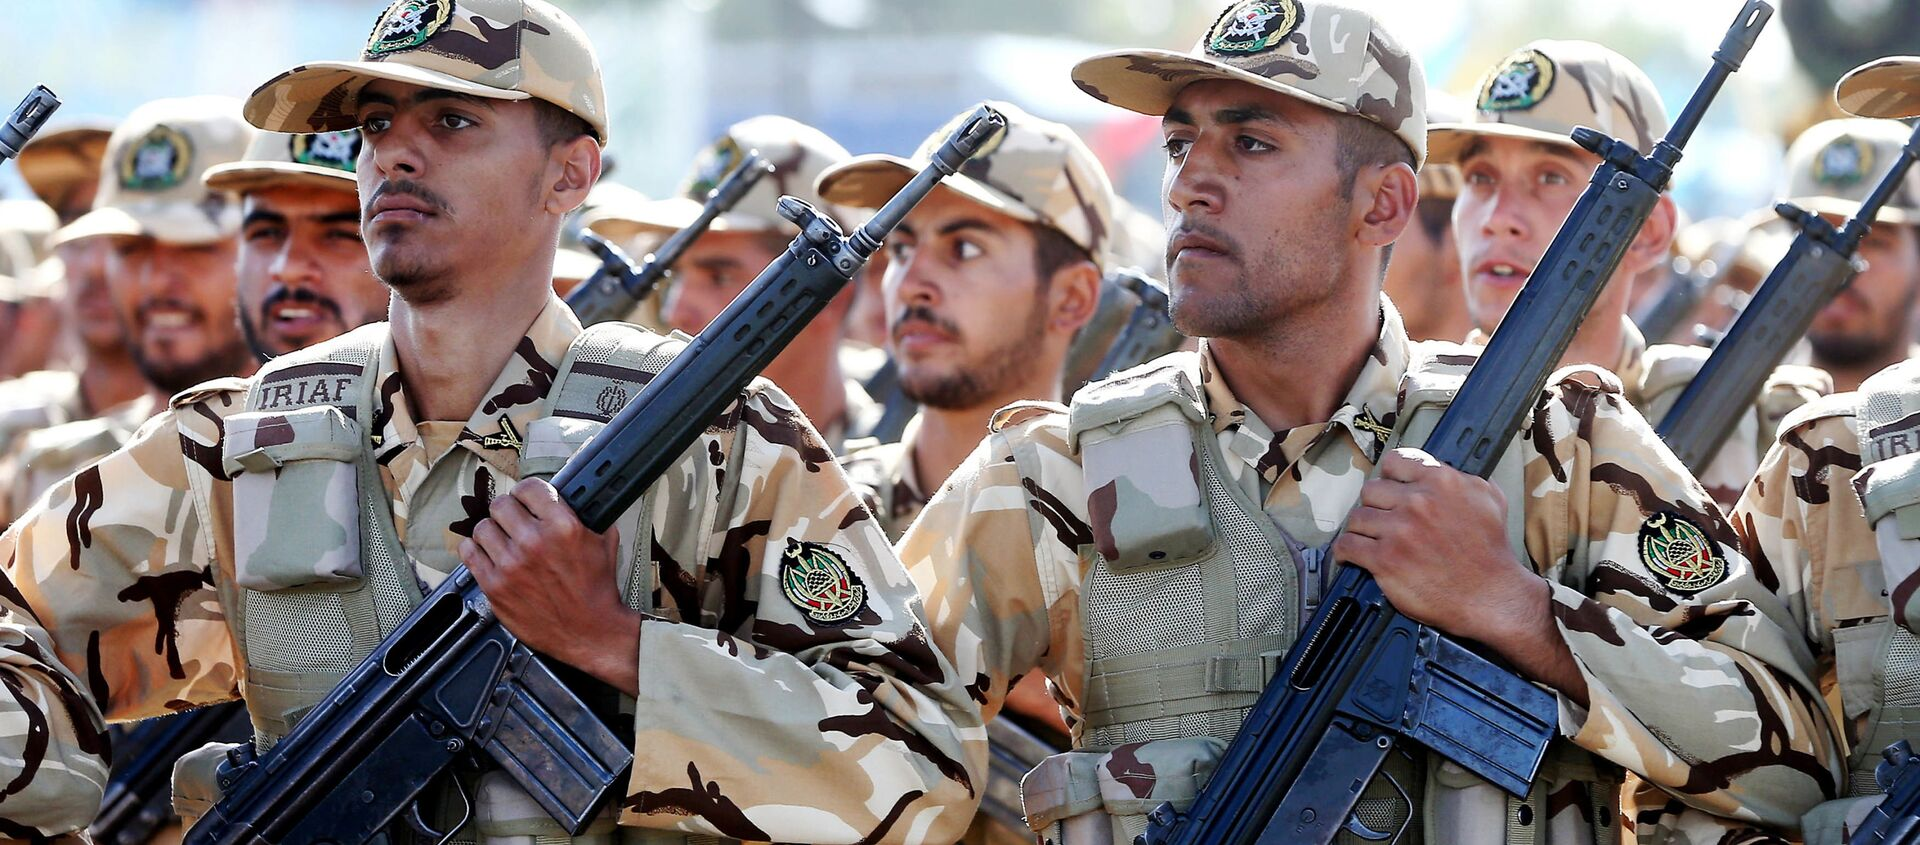 Soldati iraniani in parata militare - Sputnik Italia, 1920, 27.04.2021